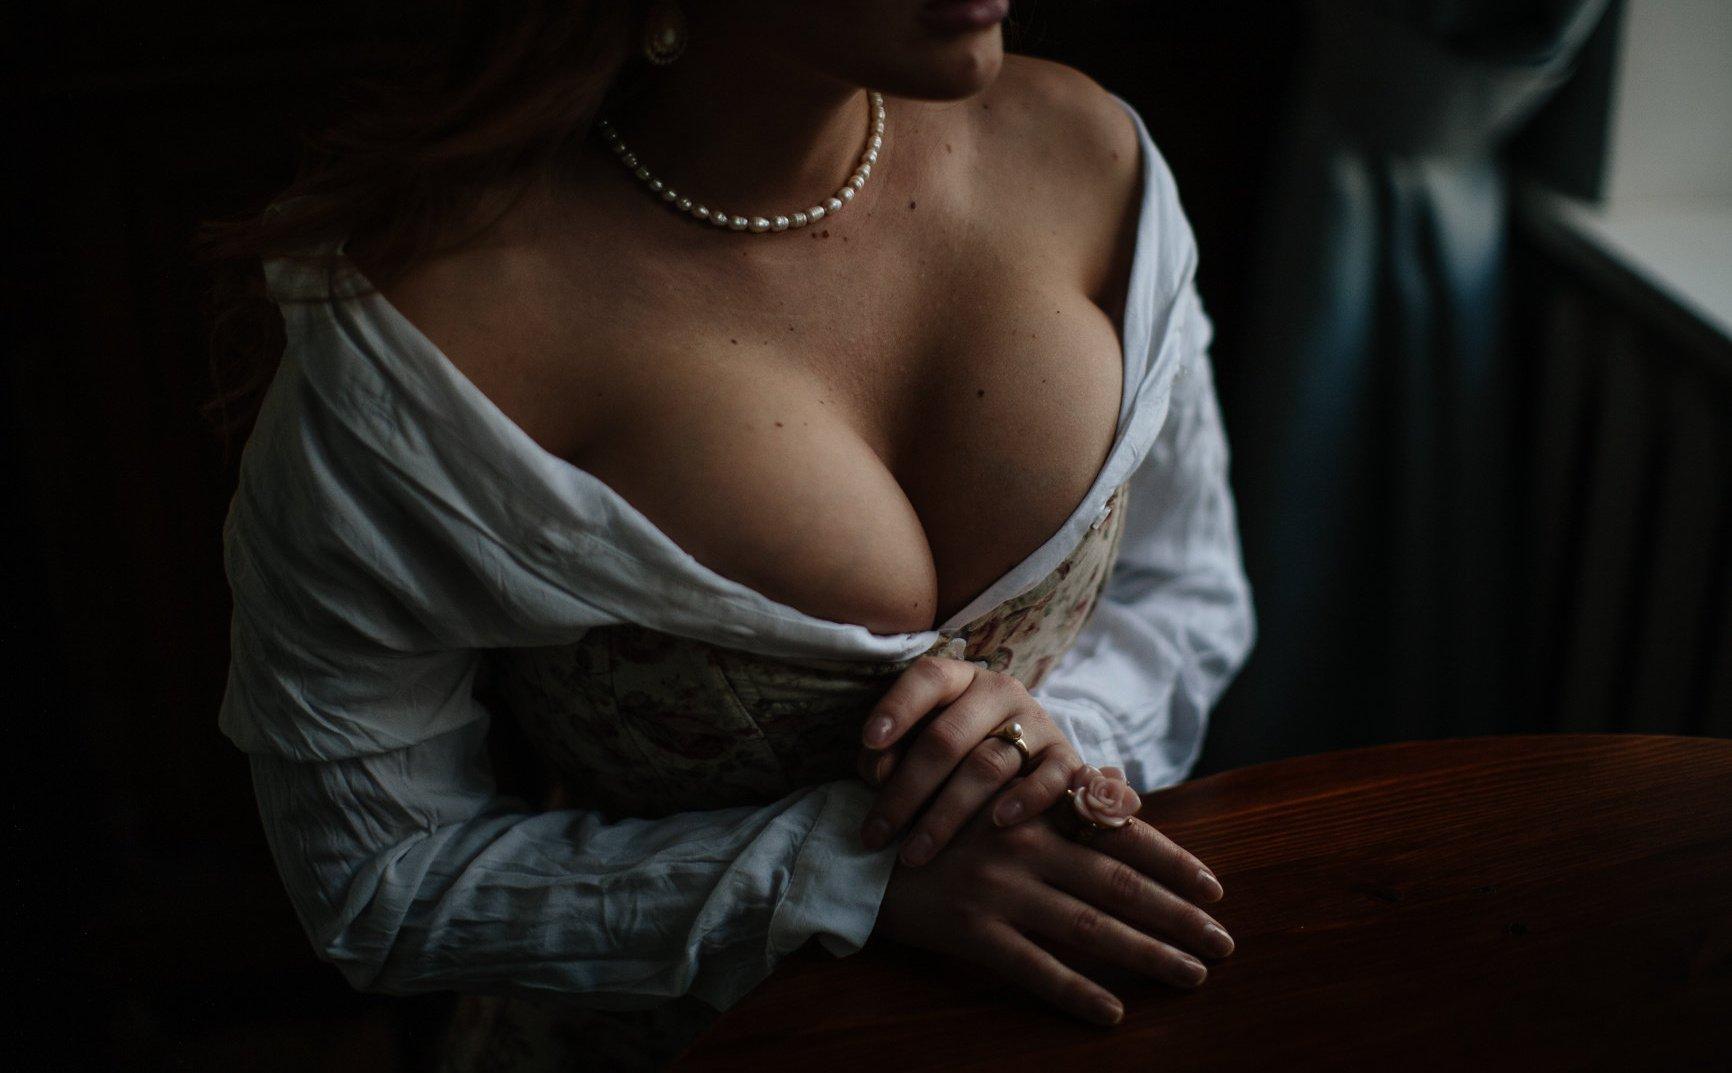 Olga Kobzar Bugs Bunny Gf Nudes Leaks 0006